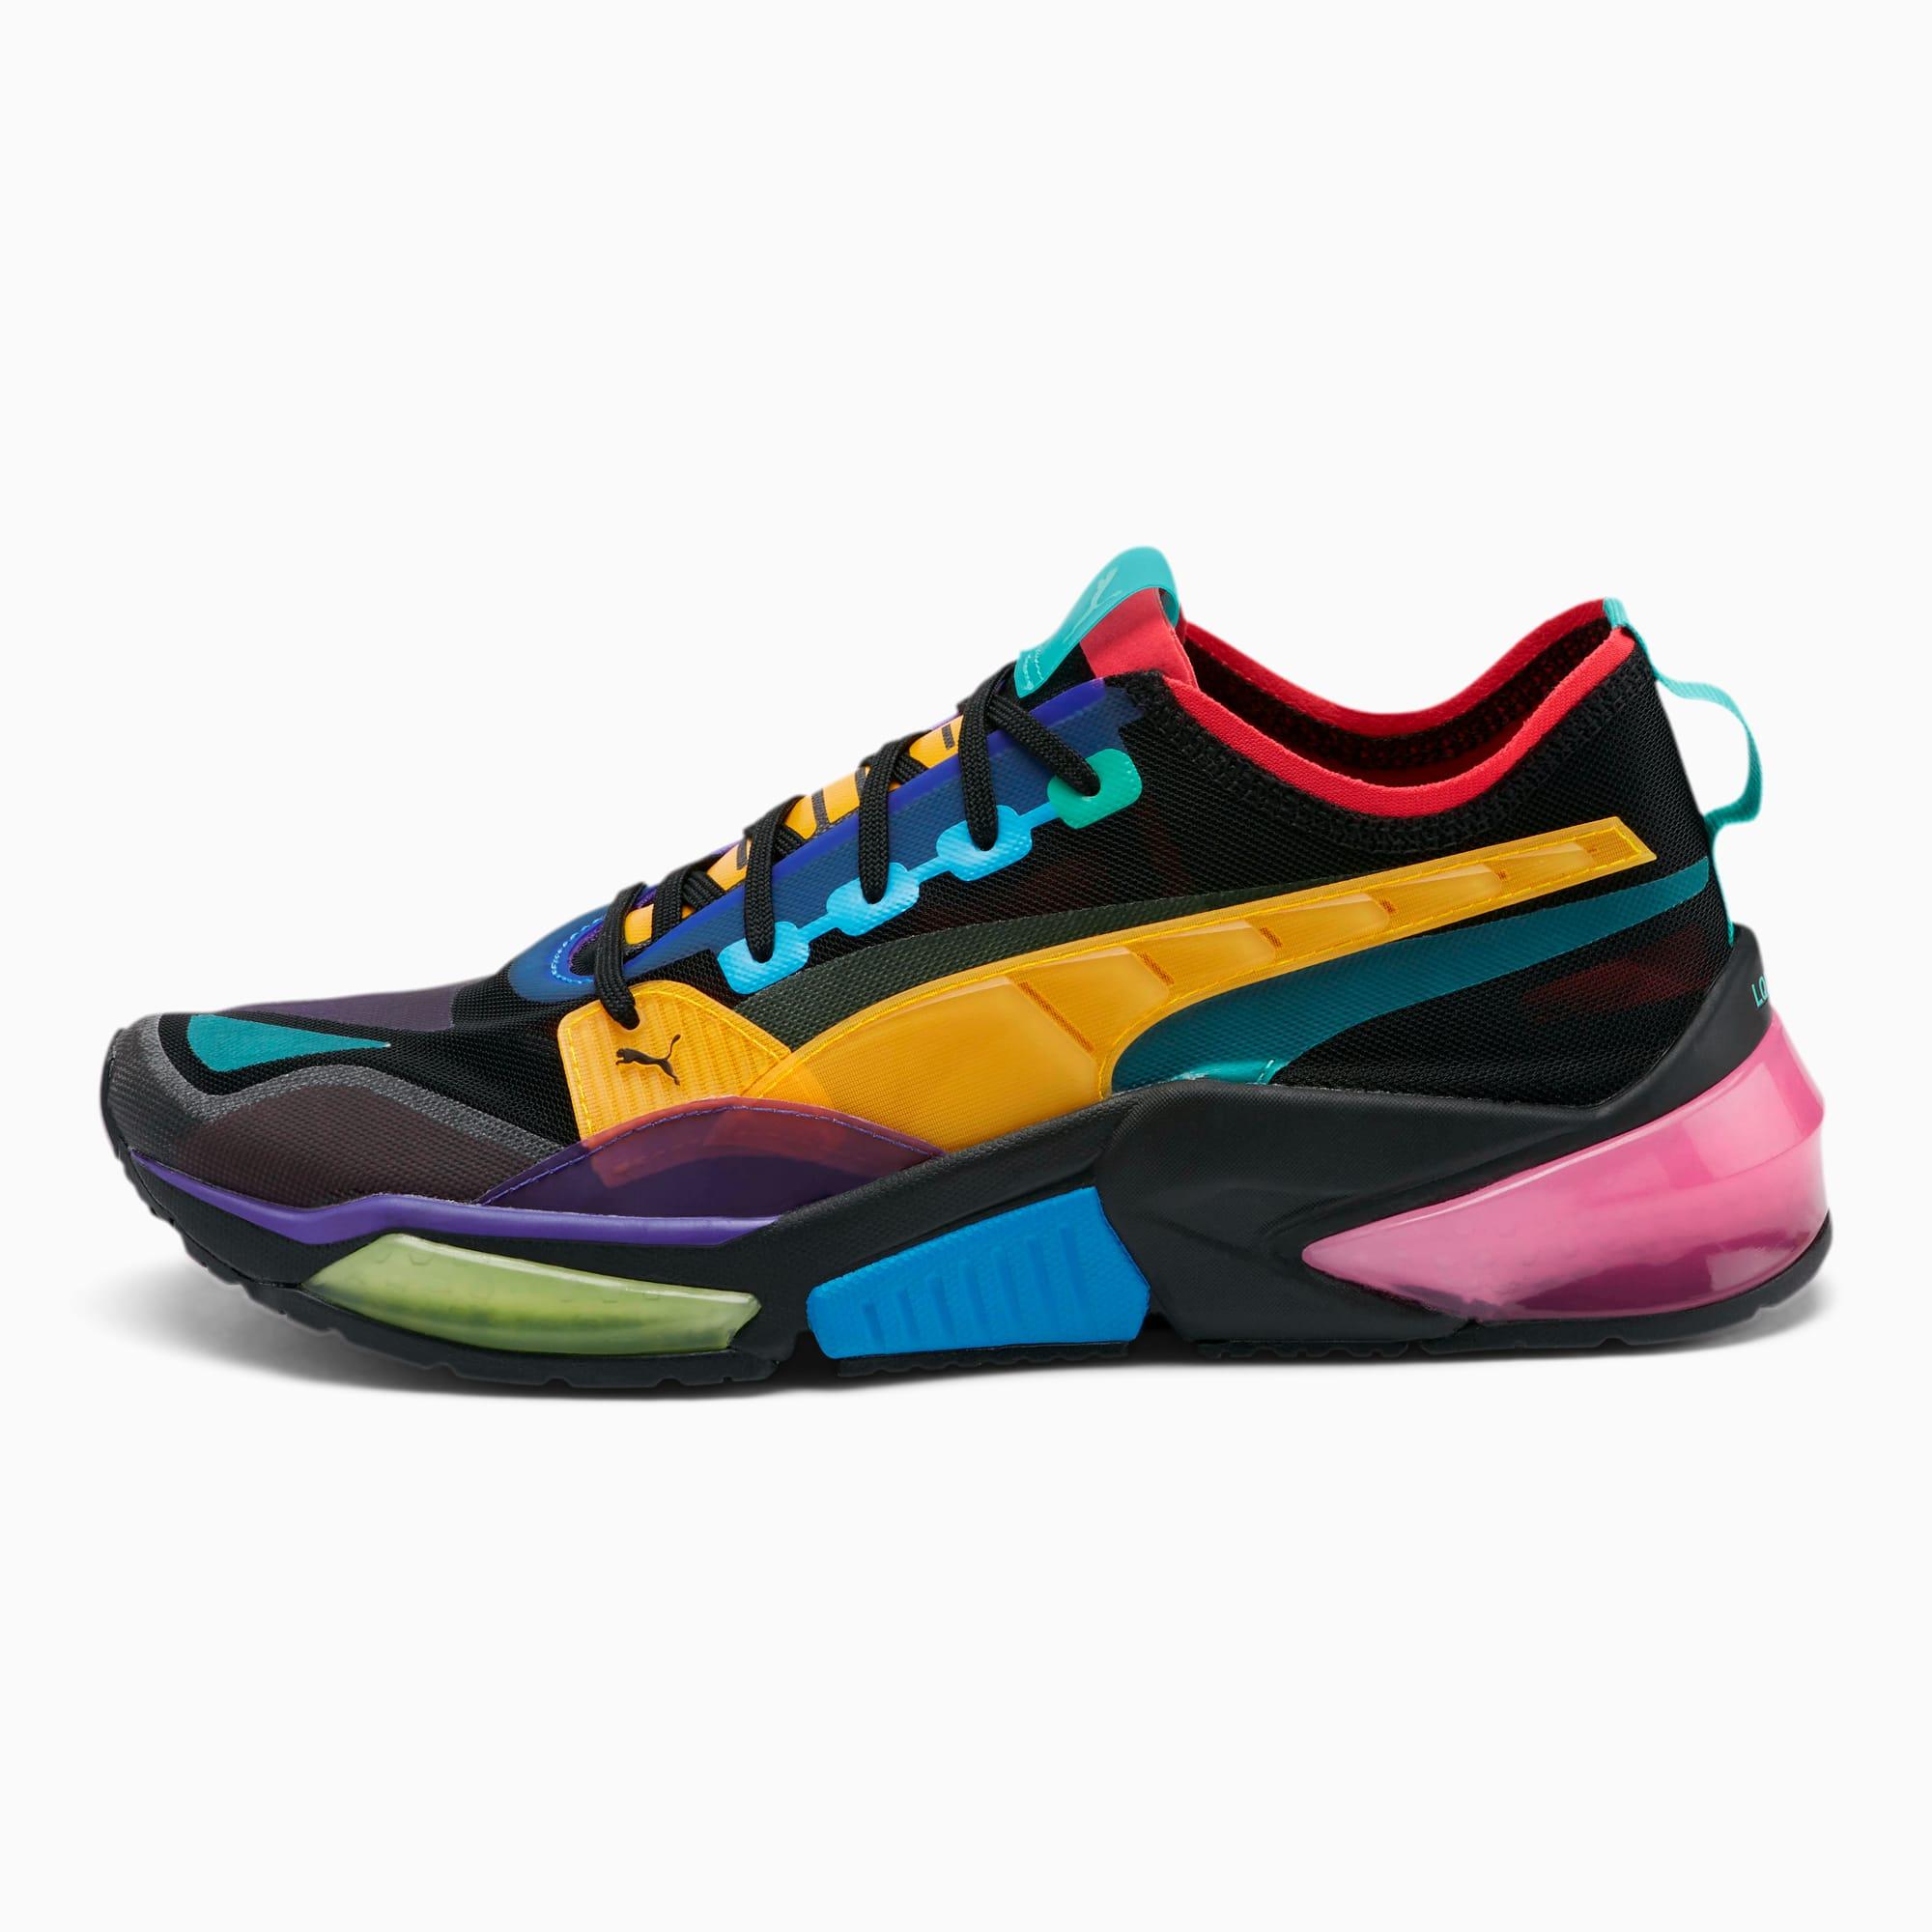 Puma-LQDCELL-Optic-Sheer.. +80 Most Inspiring Workout Shoes Ideas for Women